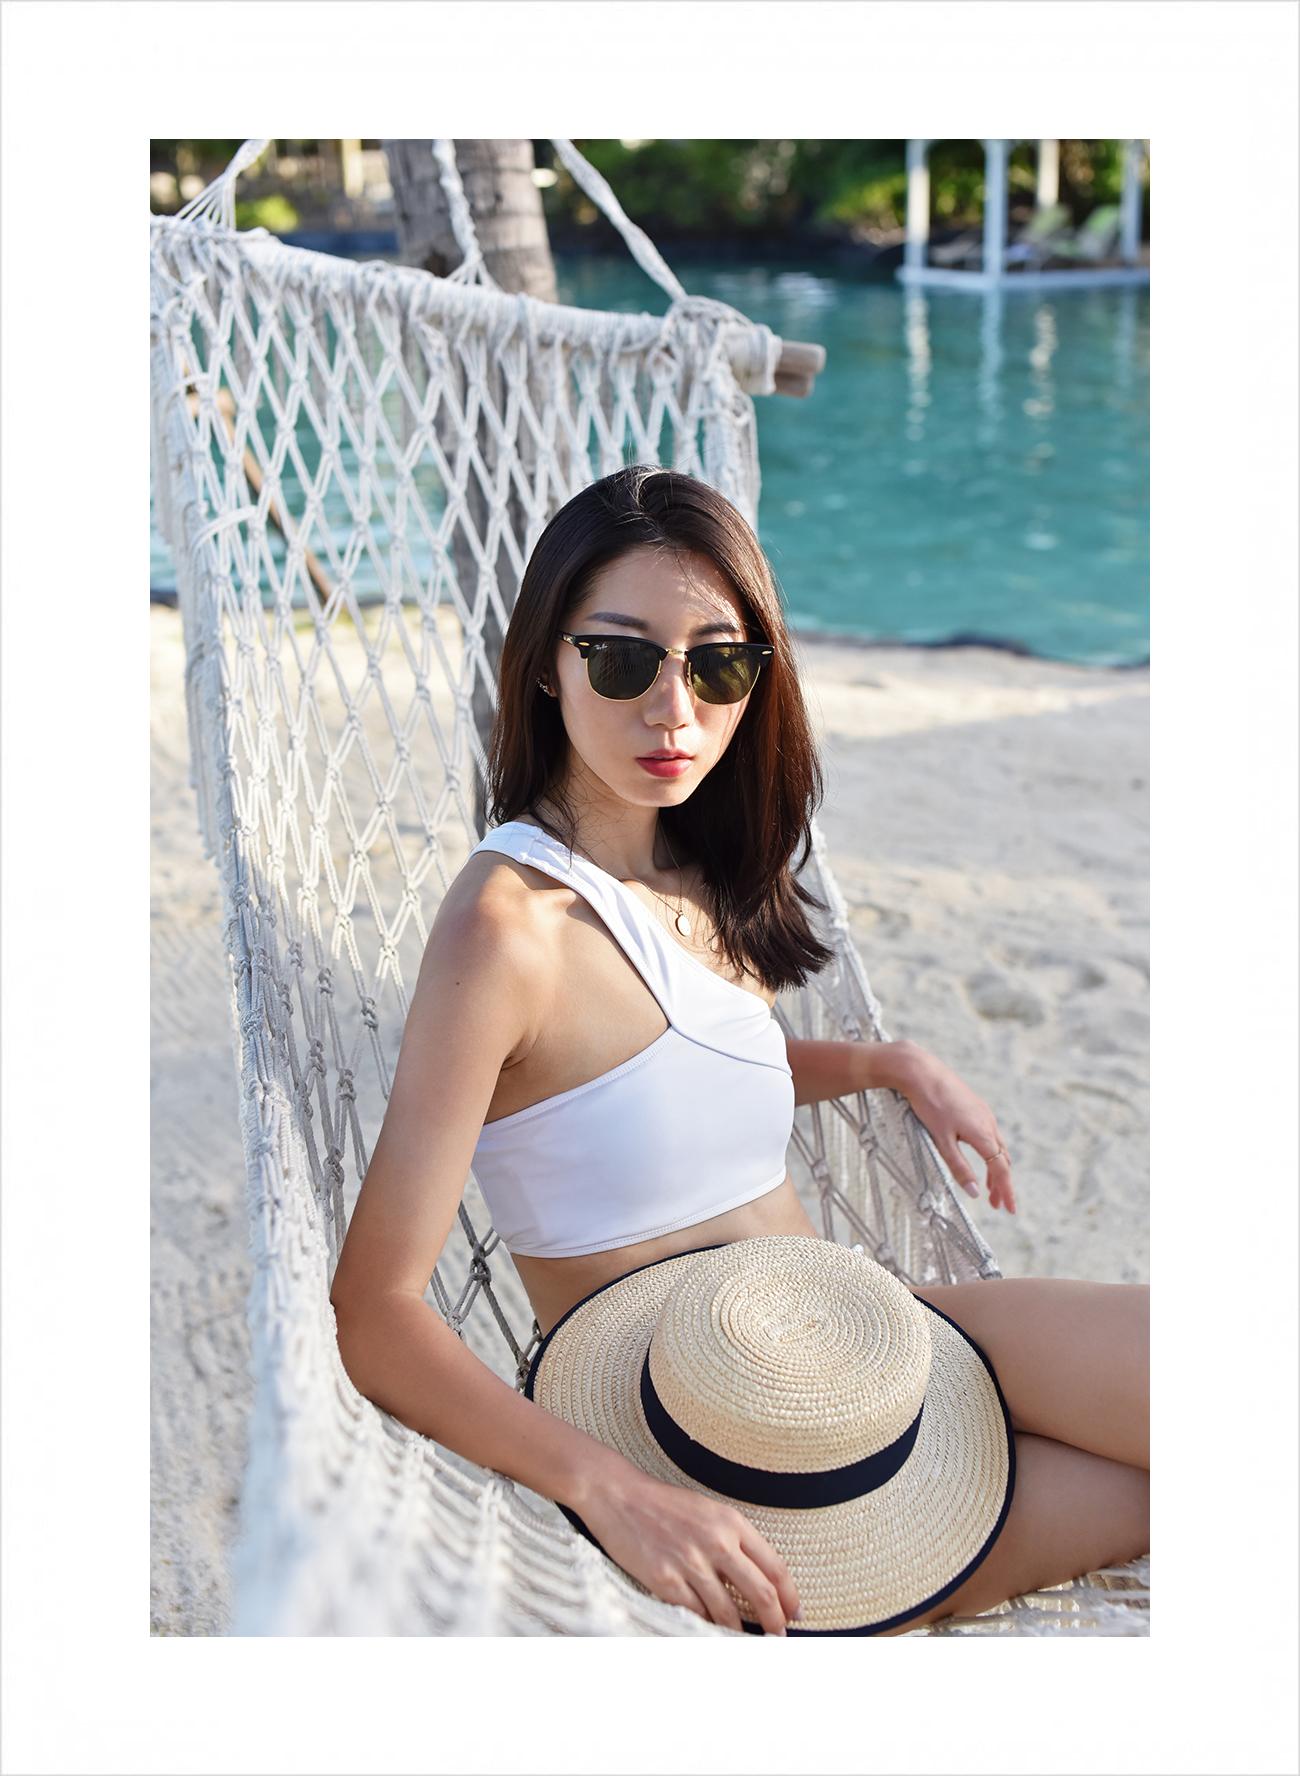 PlantationBay-Cebu-TheBeachPeople-Bikini-3